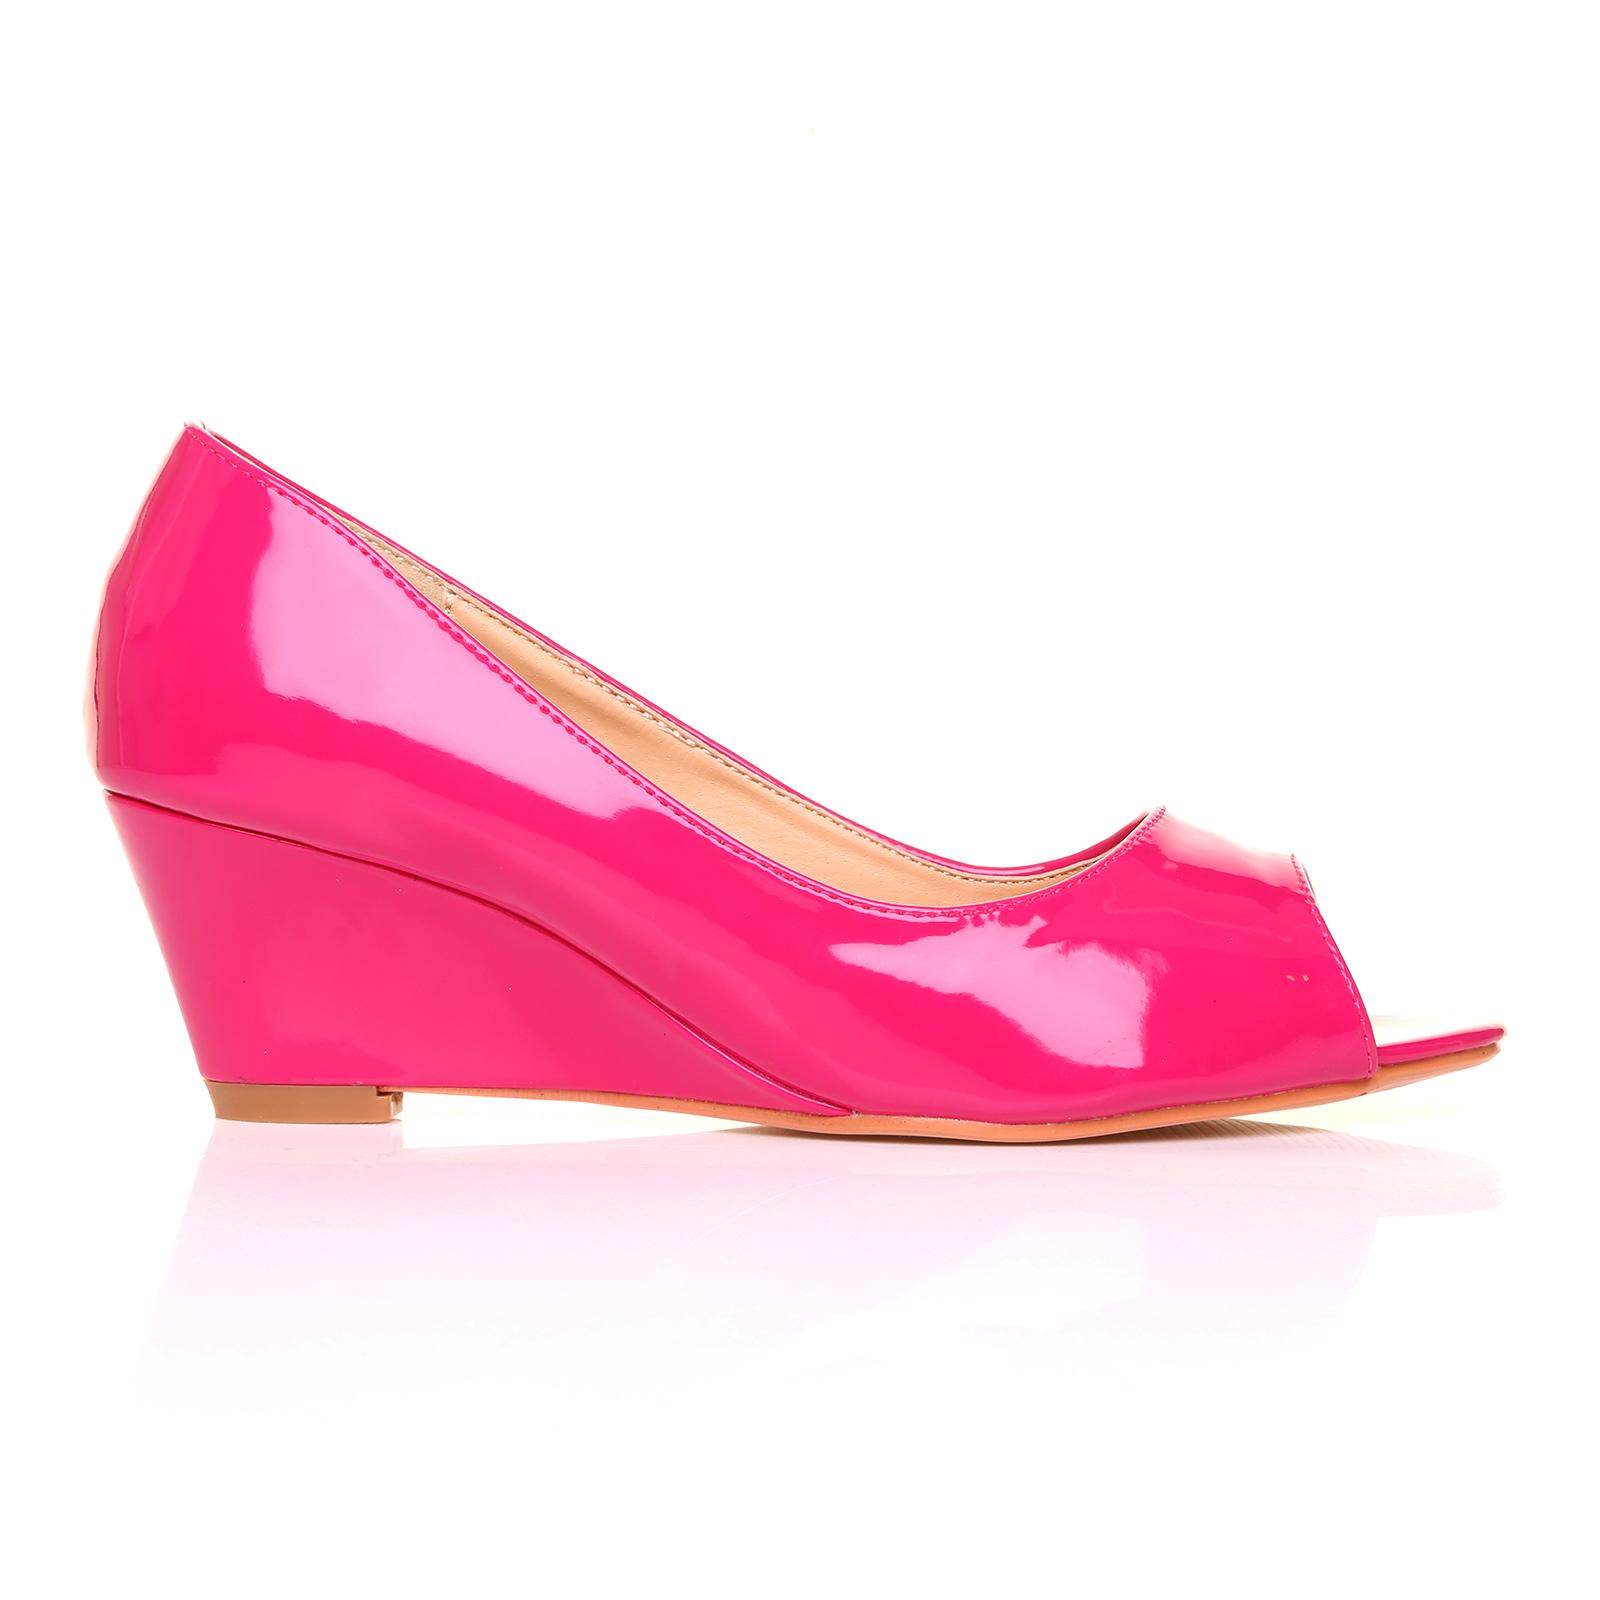 brand new peep toe wedge heel formal smart